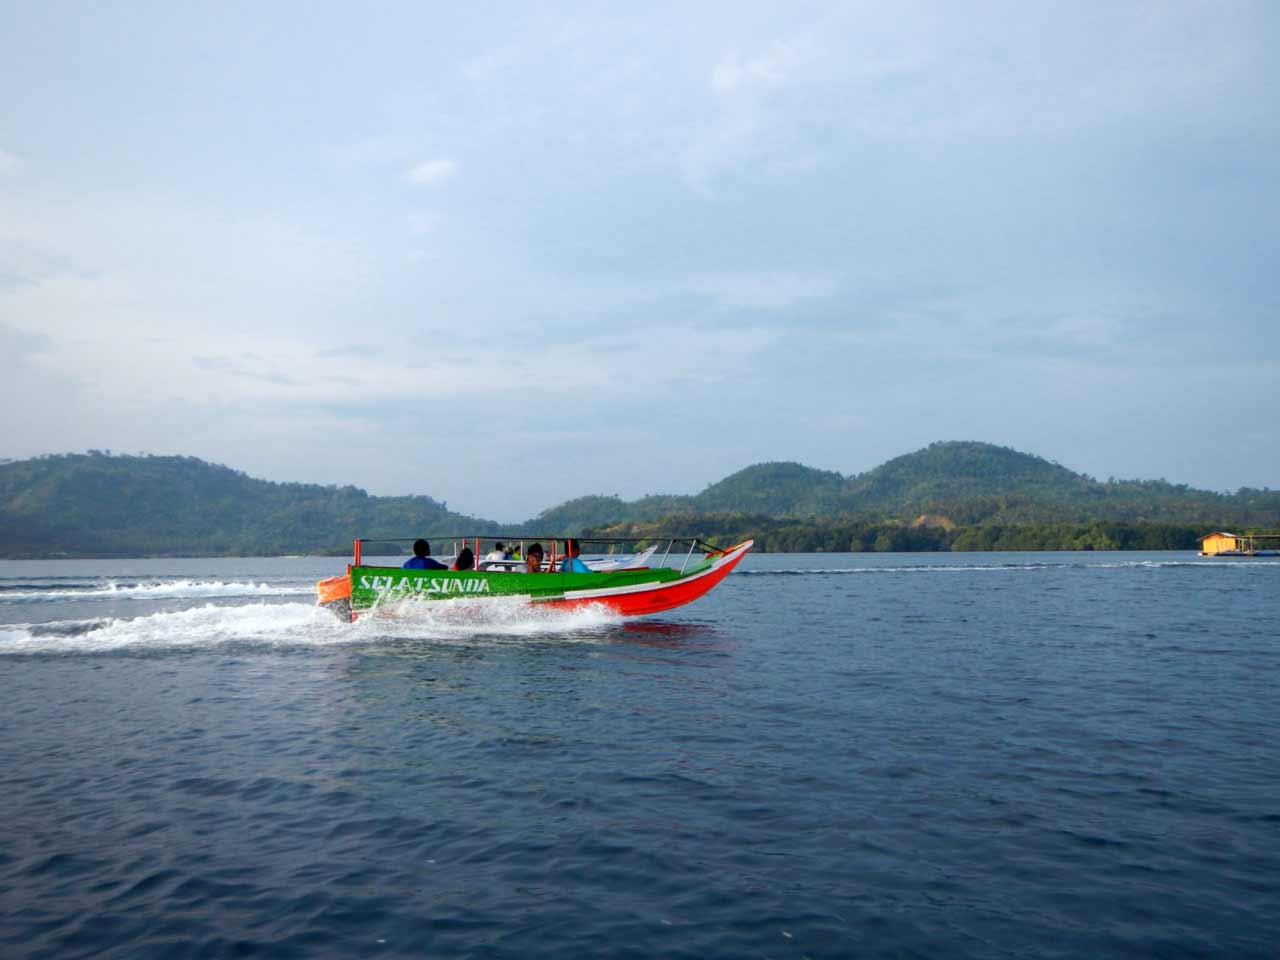 Foto Gambar Speed Boat dari Dermaga Ketapang Pesawaran - kelilinglampung.net - Yopie Pangkey - 4